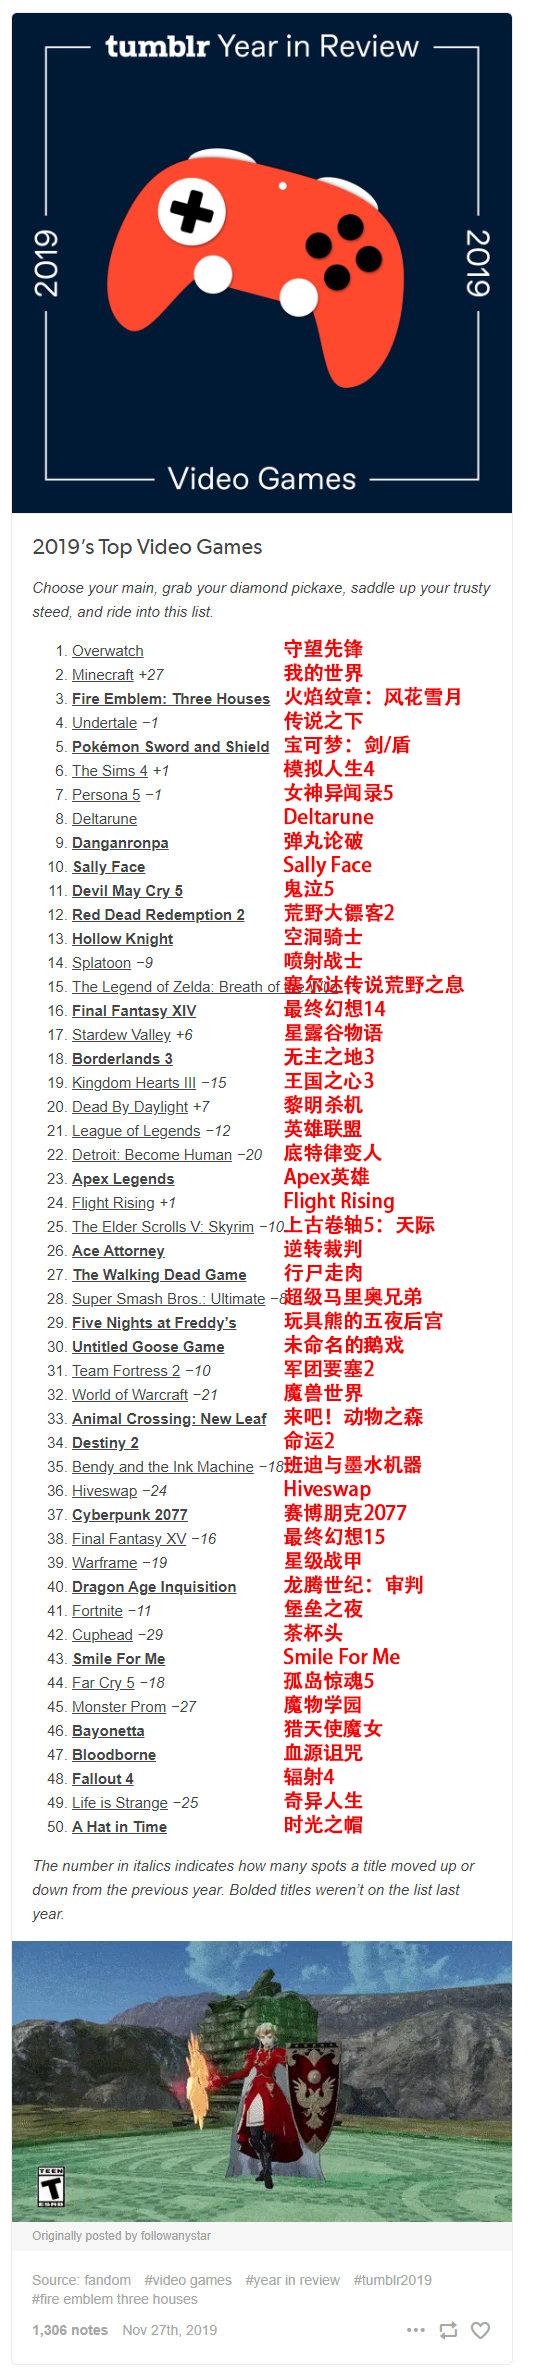 Tumblr年度游戏榜《守望》第一 亚瑟·摩根最受欢迎